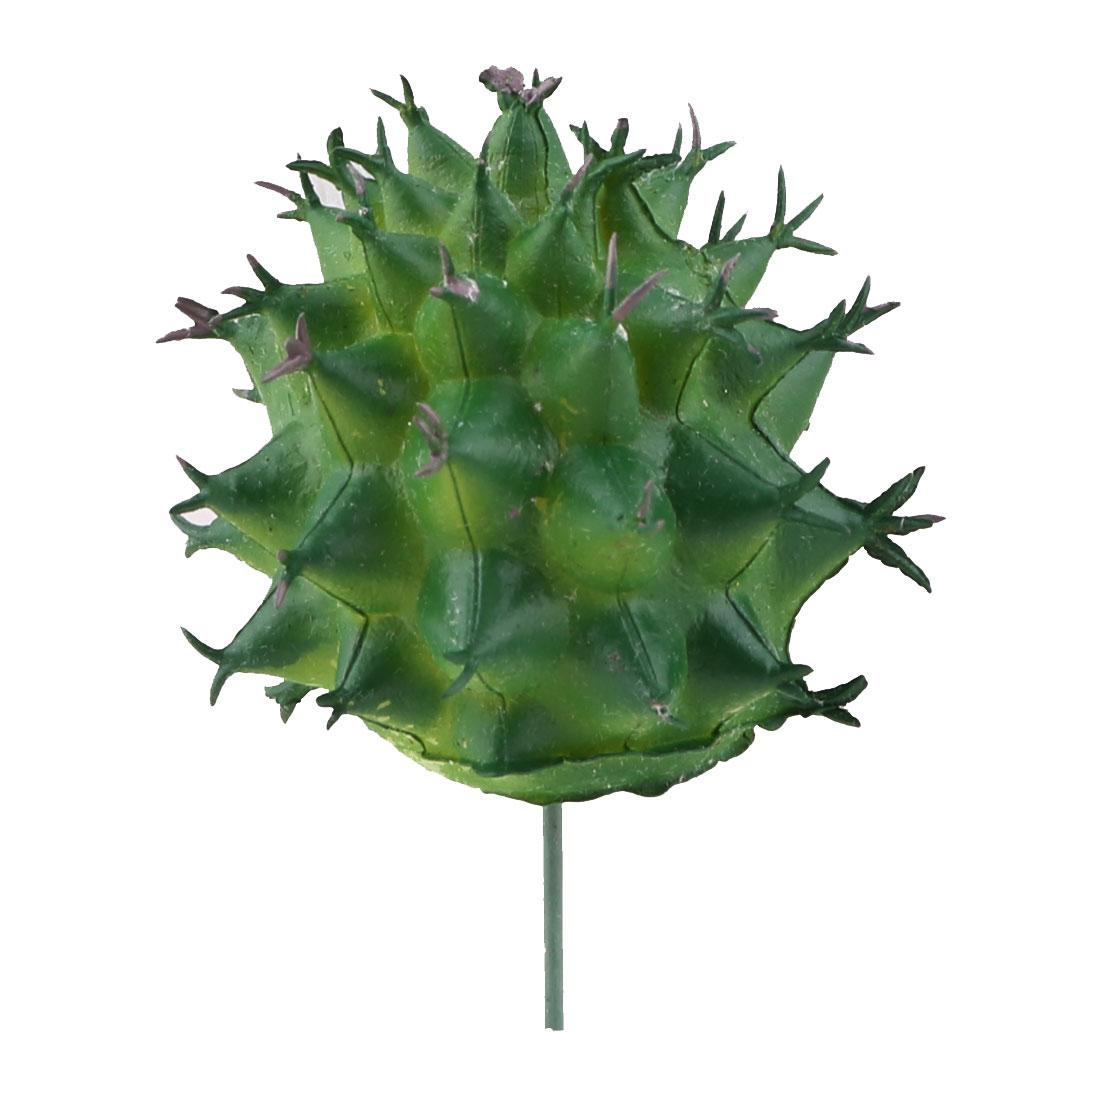 Home Plastic DIY Craft Artificial Emulation Succulent Plant Green 1.7 Inches Dia